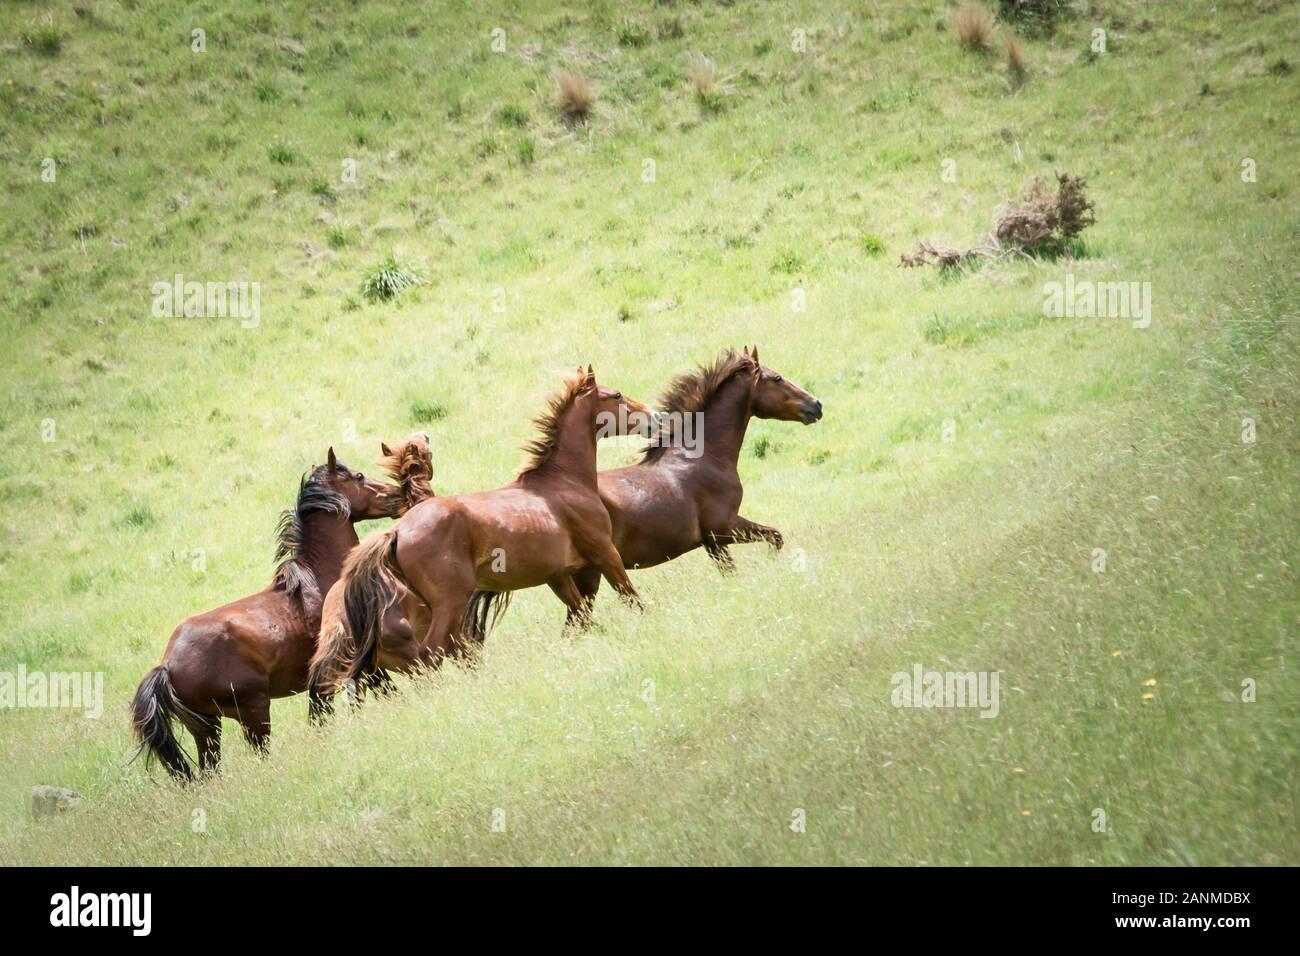 Wild Horses Running In The Green Kaimanawa Mountain Ranges New Zealand Stock Photo Alamy